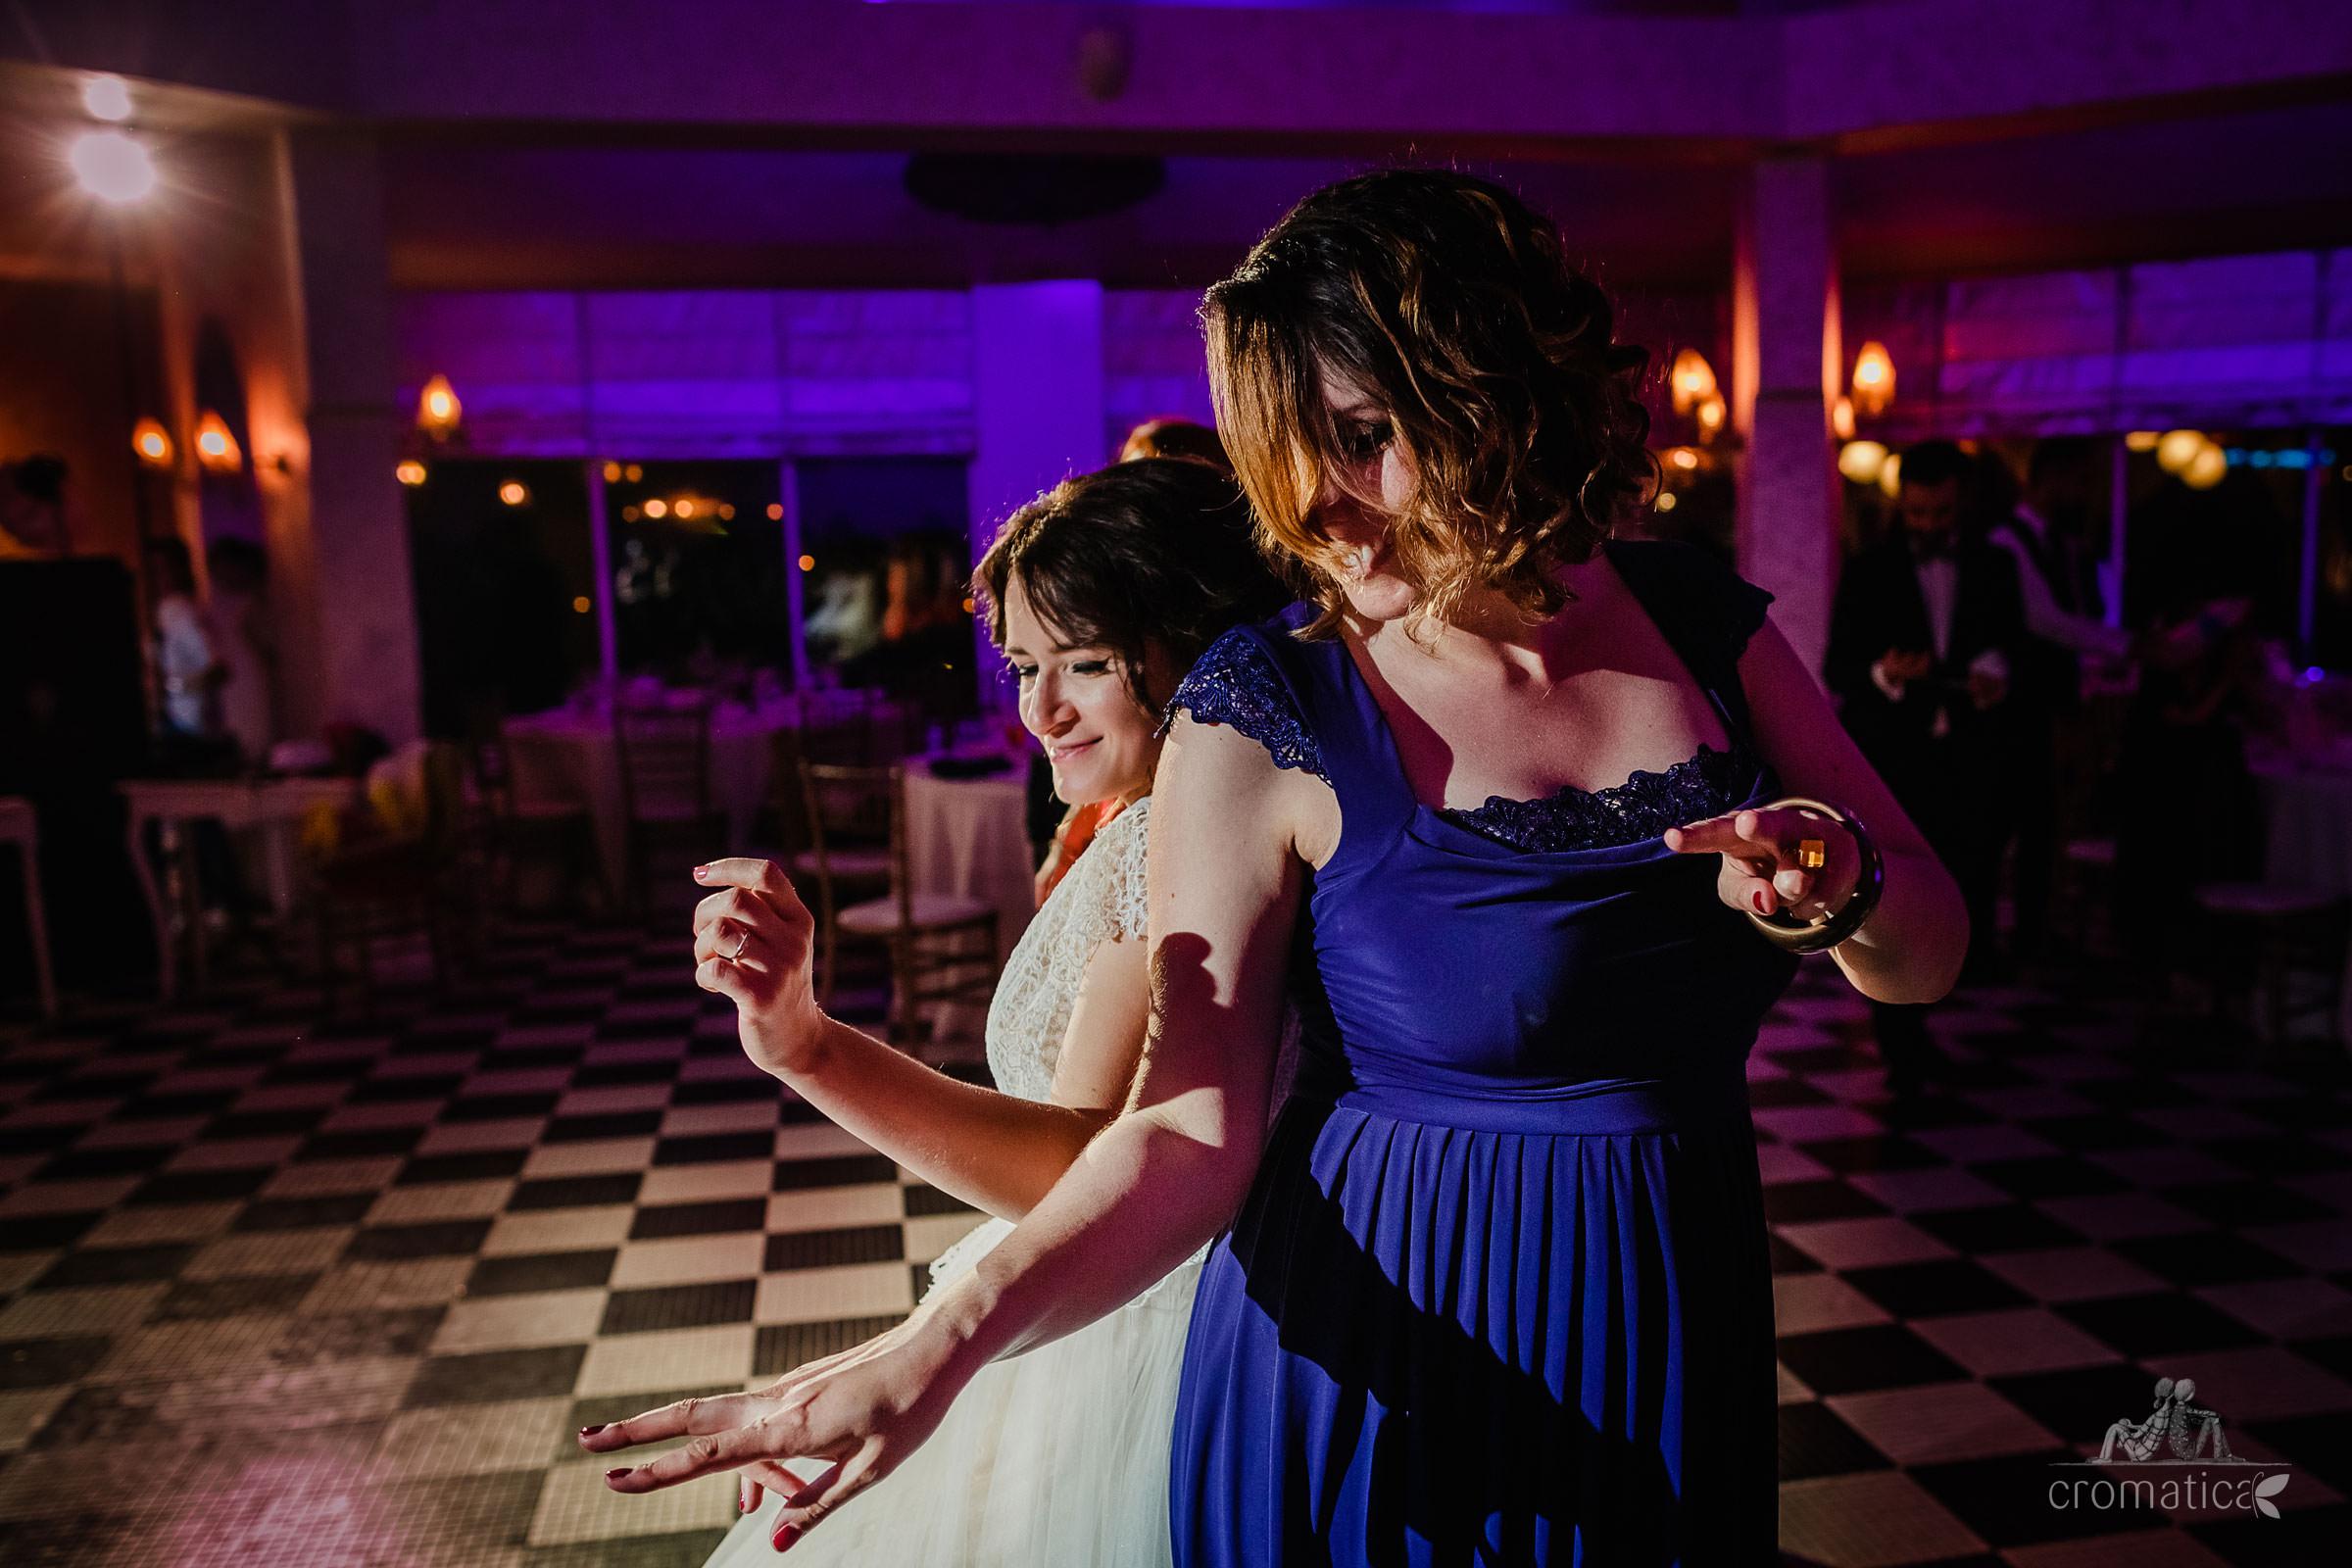 roxana mihai fotografii nunta la seratta 068